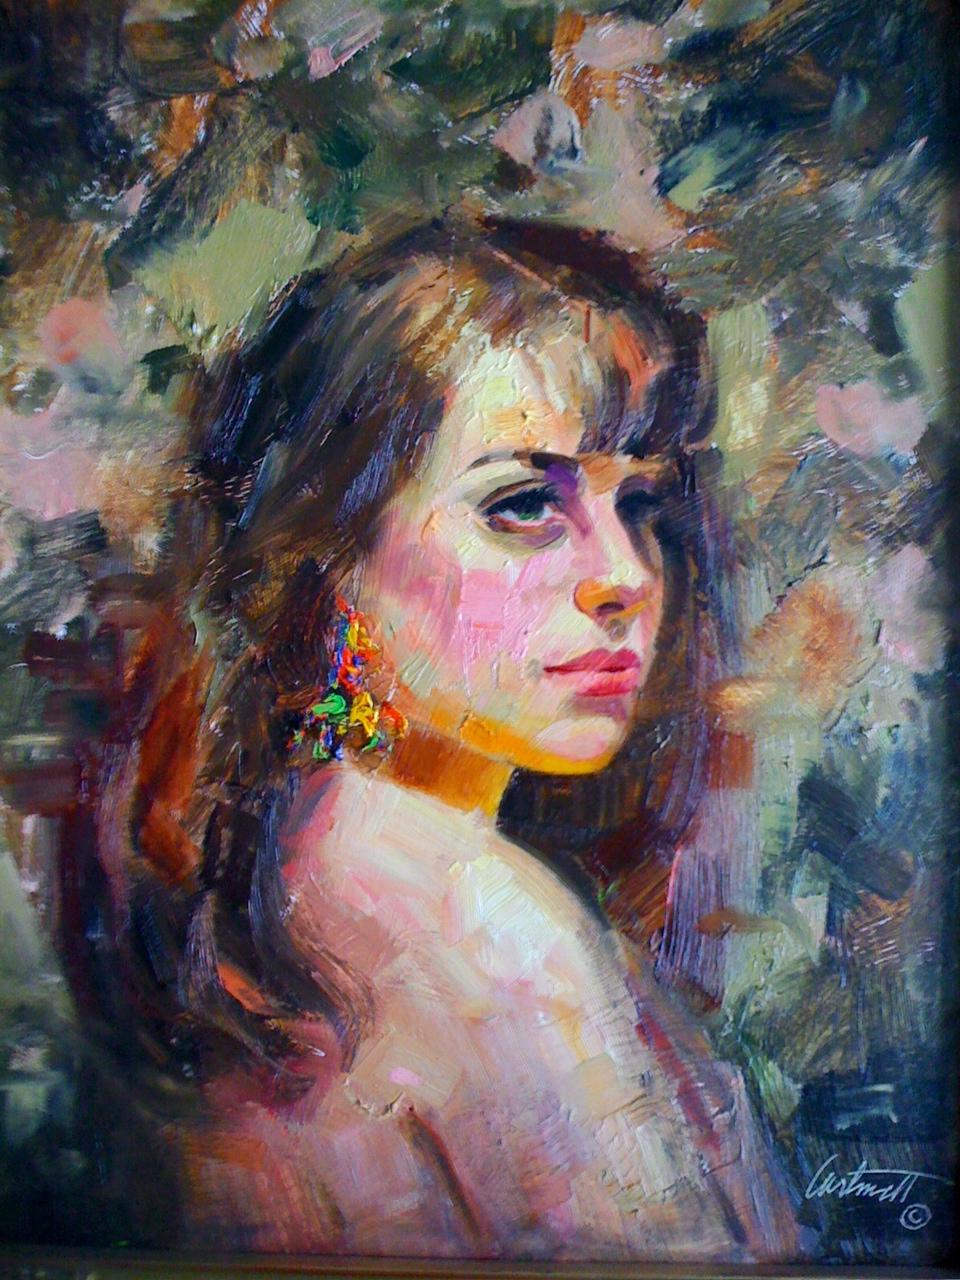 Portraits Of Men In Oil Paint